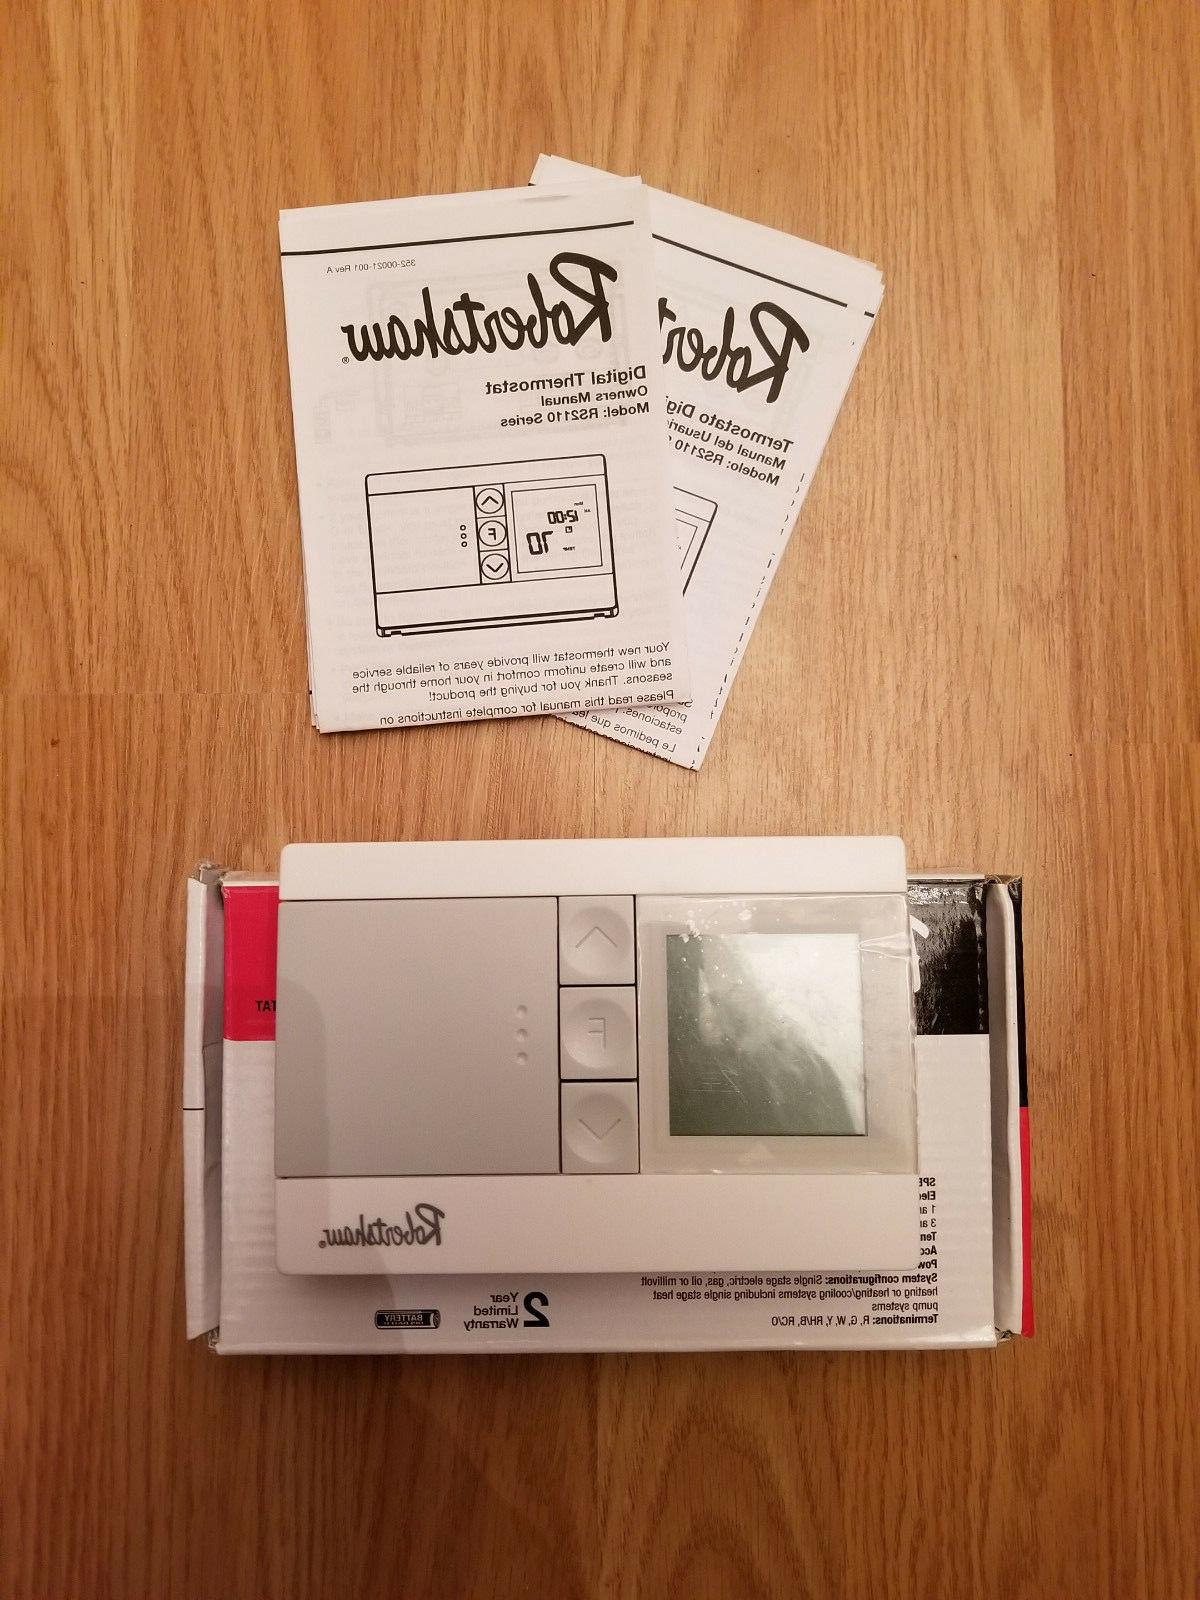 Robertshaw RS2110-Digital Heat-1-Cool-NEW-Open Box